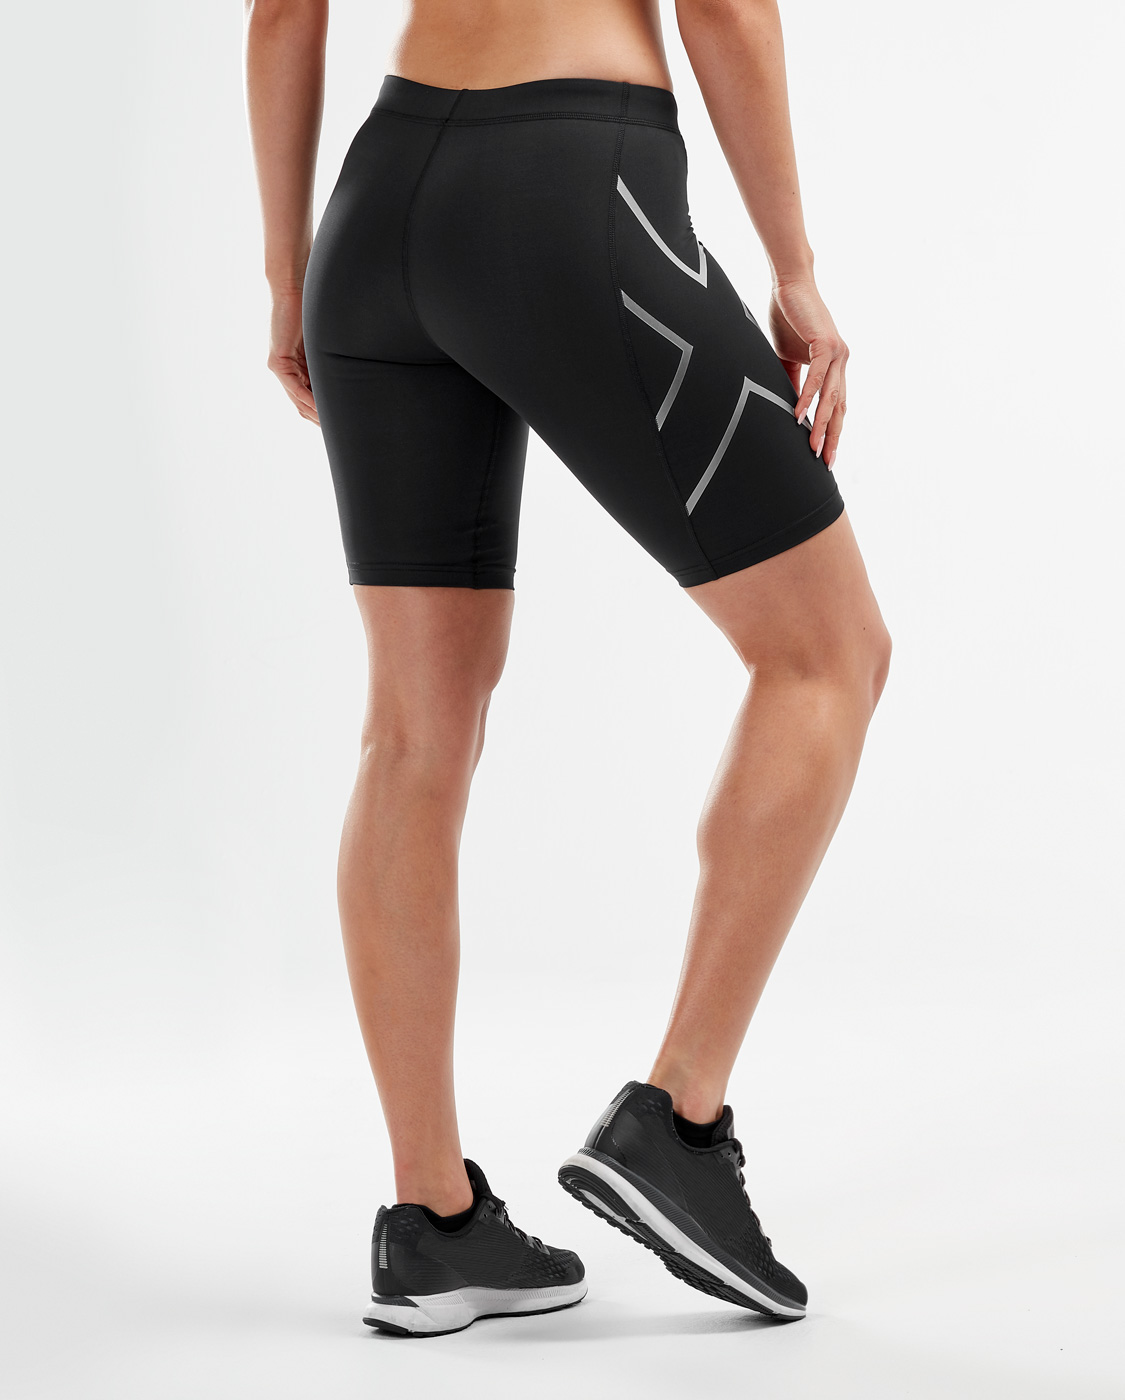 2XU Women's Compression Short - Black/Silver